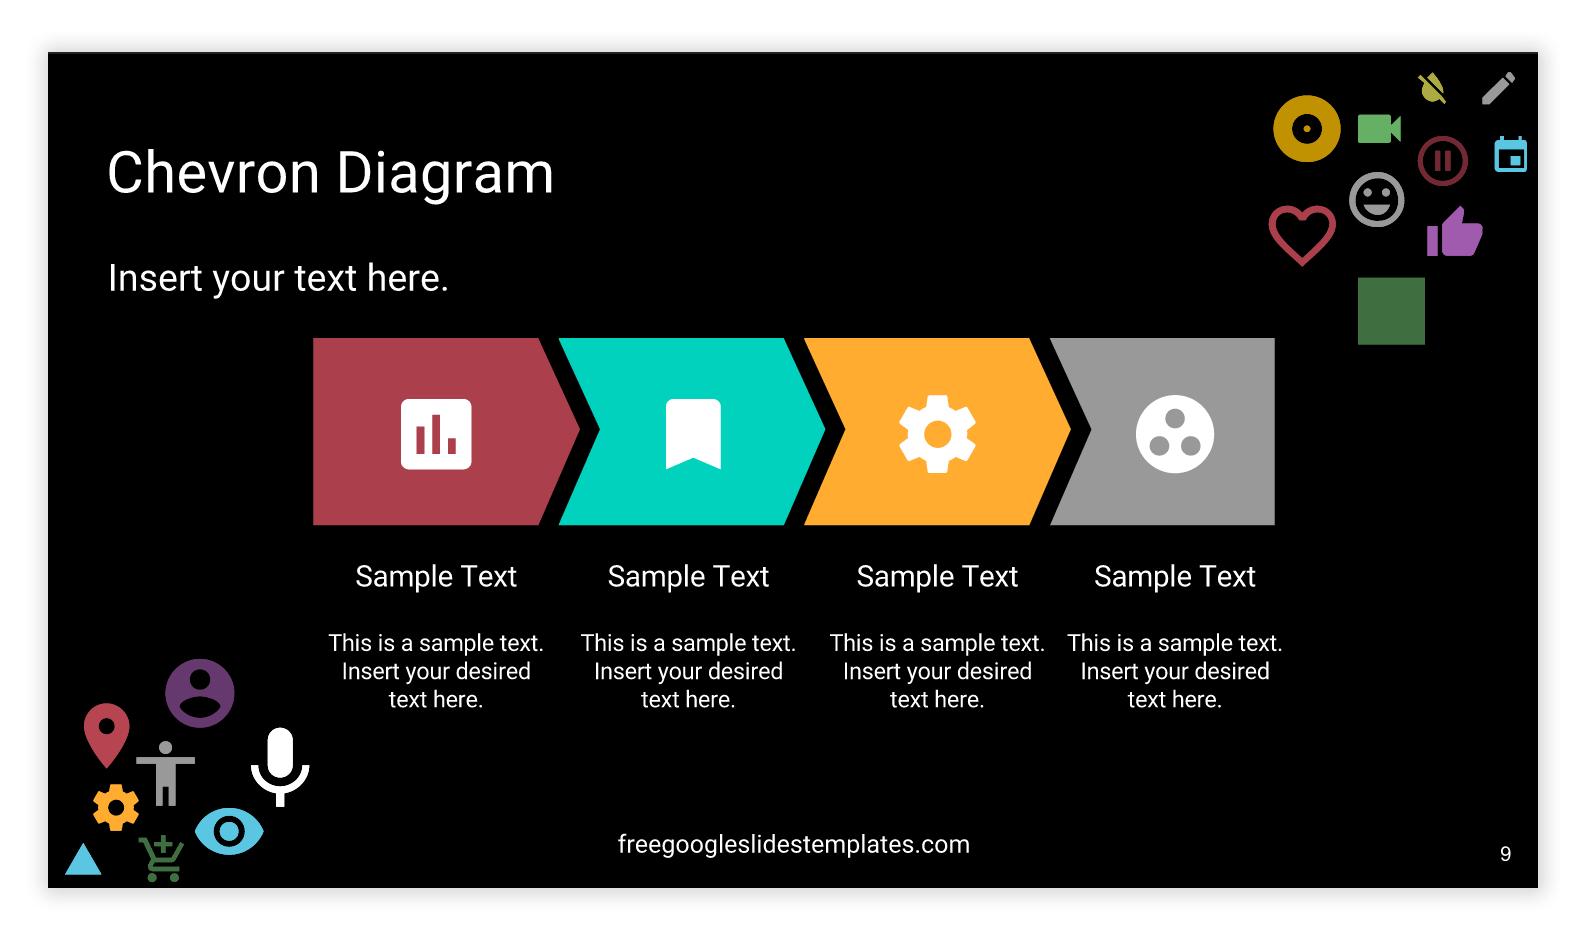 Free Google Slides Templates for presentation